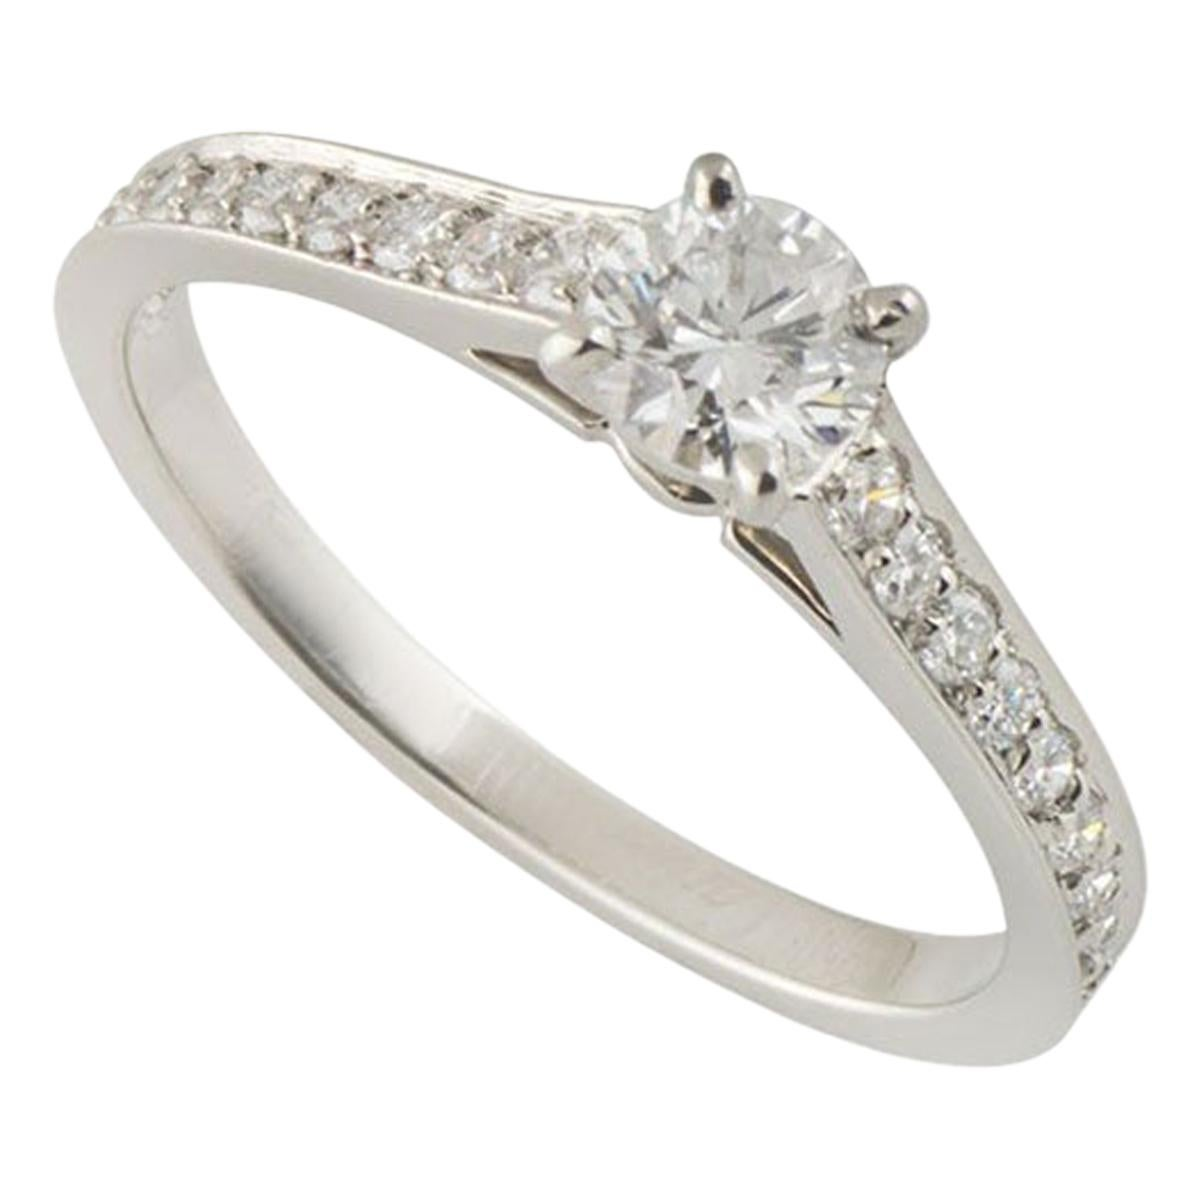 CartierPlatinum Diamond 1895 Solitaire Engagement Ring